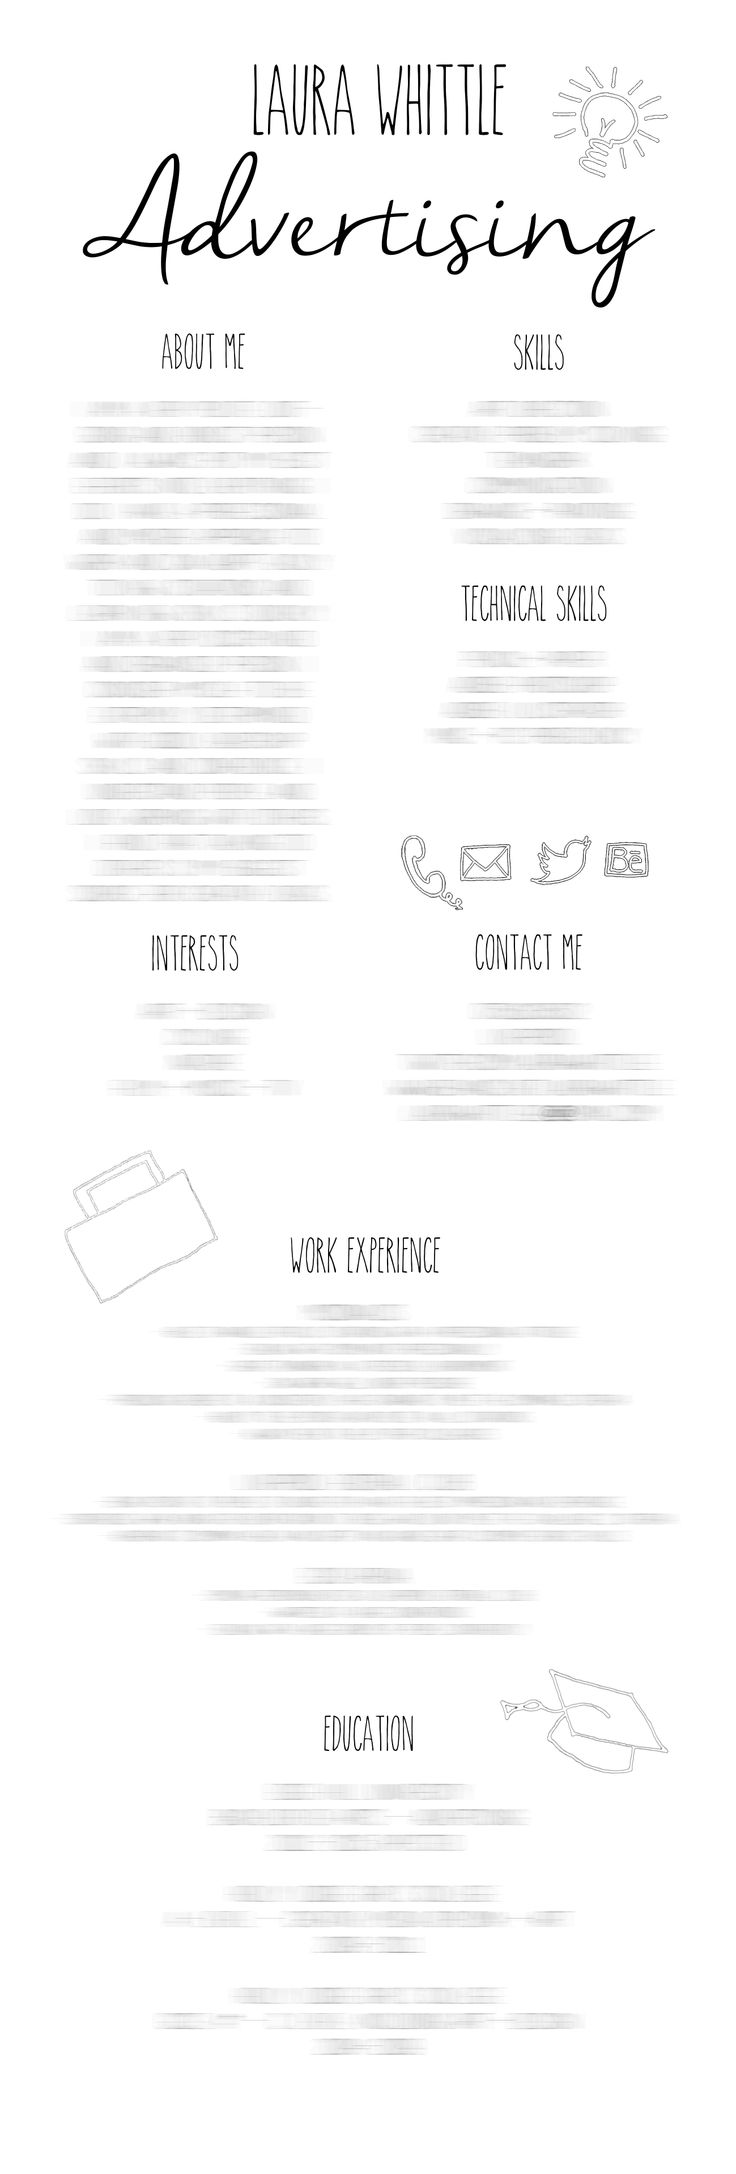 Creative CV Layout - simple, black  white, advertising, branding, student